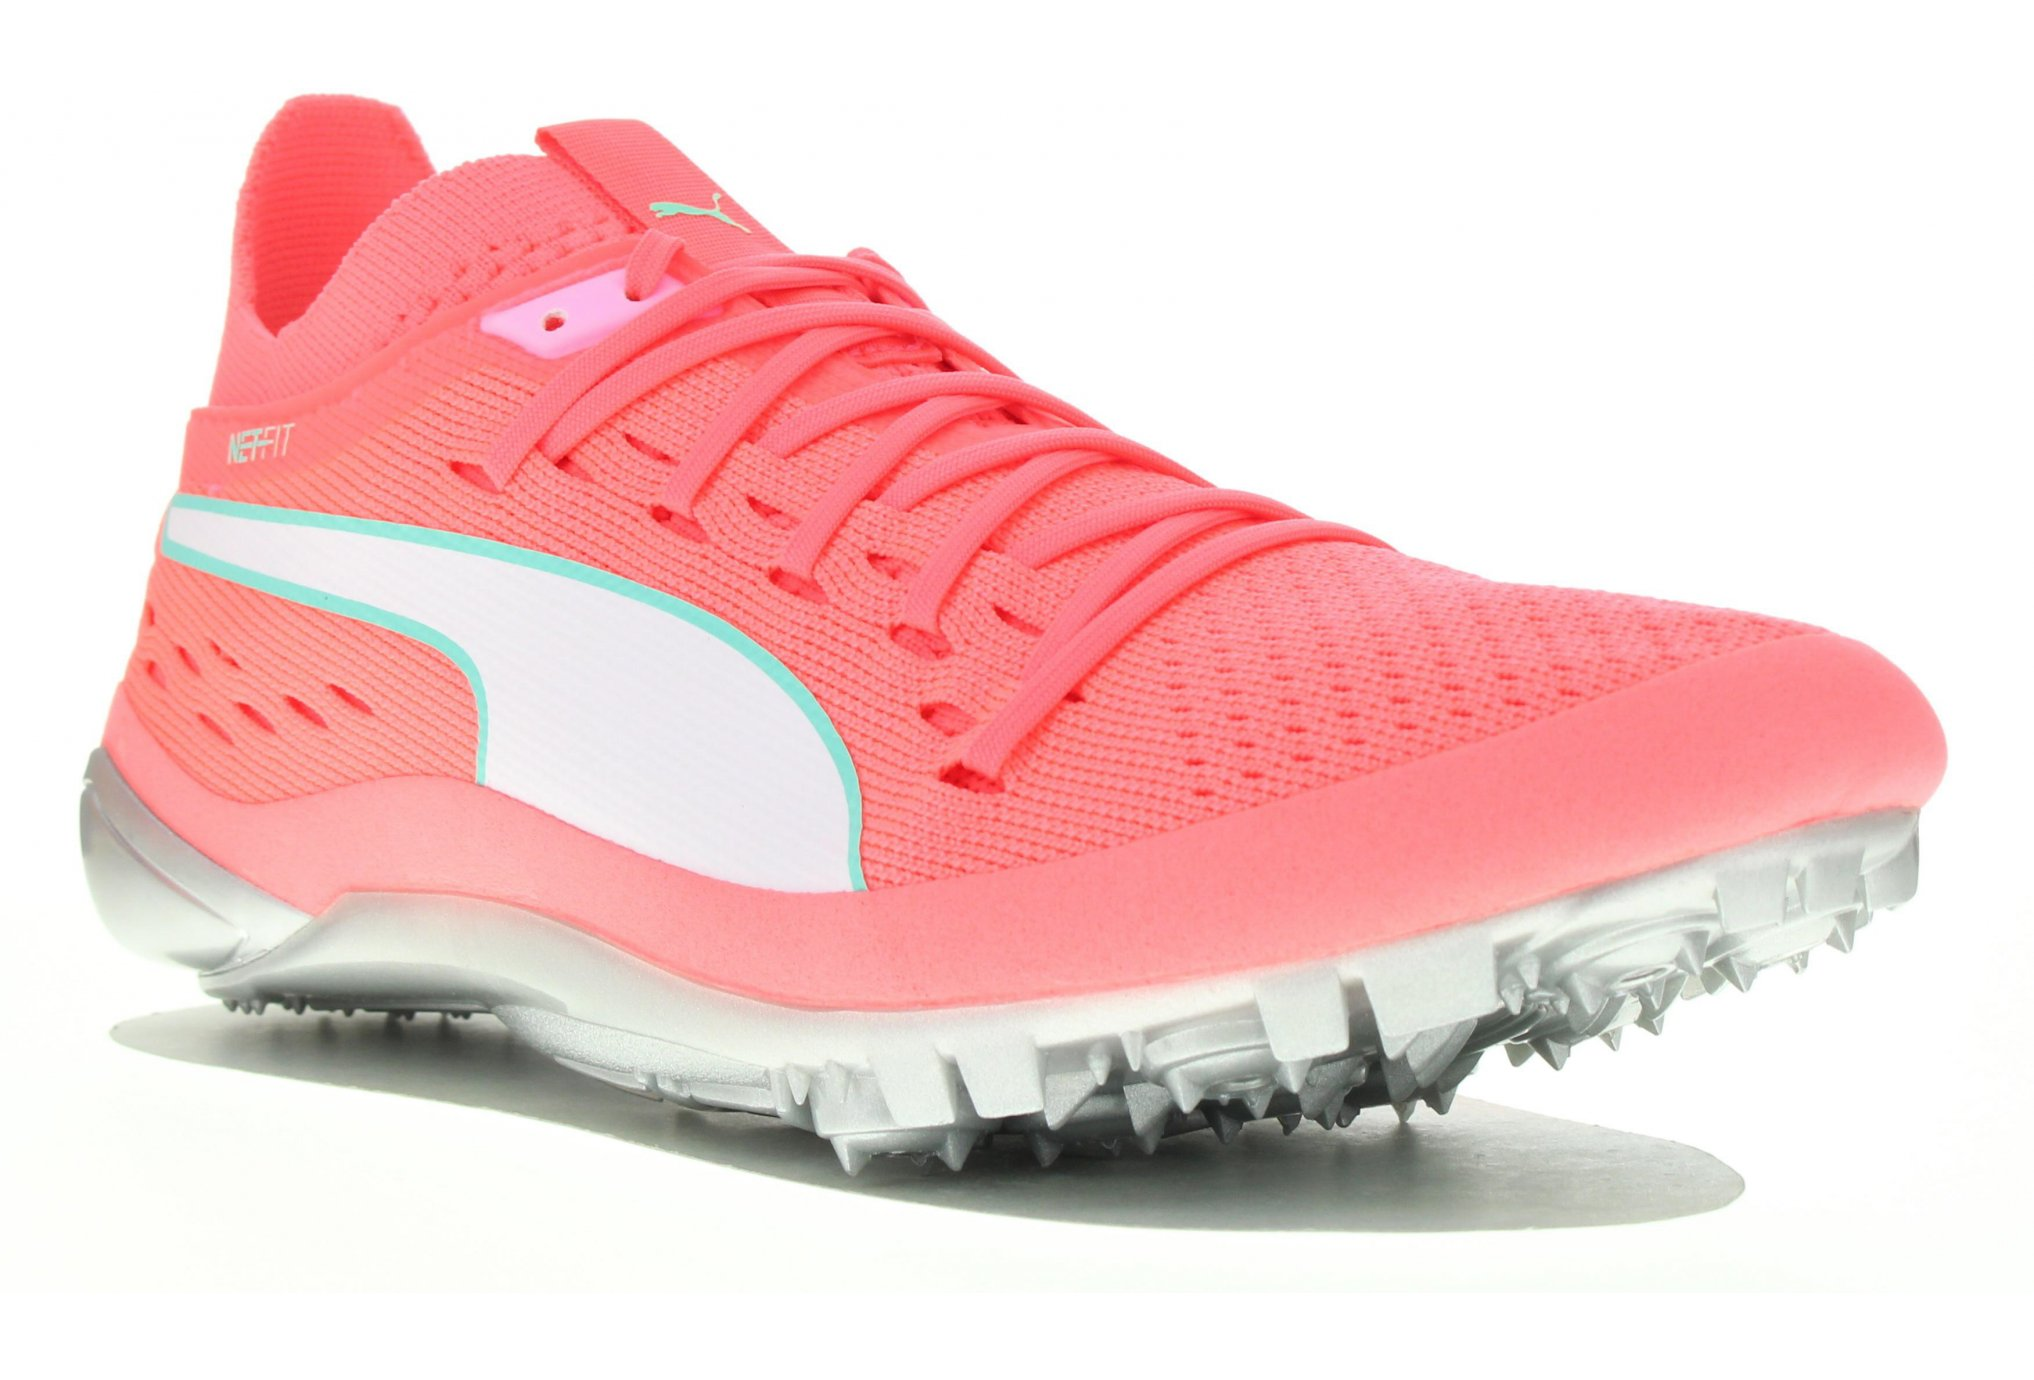 Puma EvoSpeed Netfit Sprint 2 W Diététique Chaussures femme